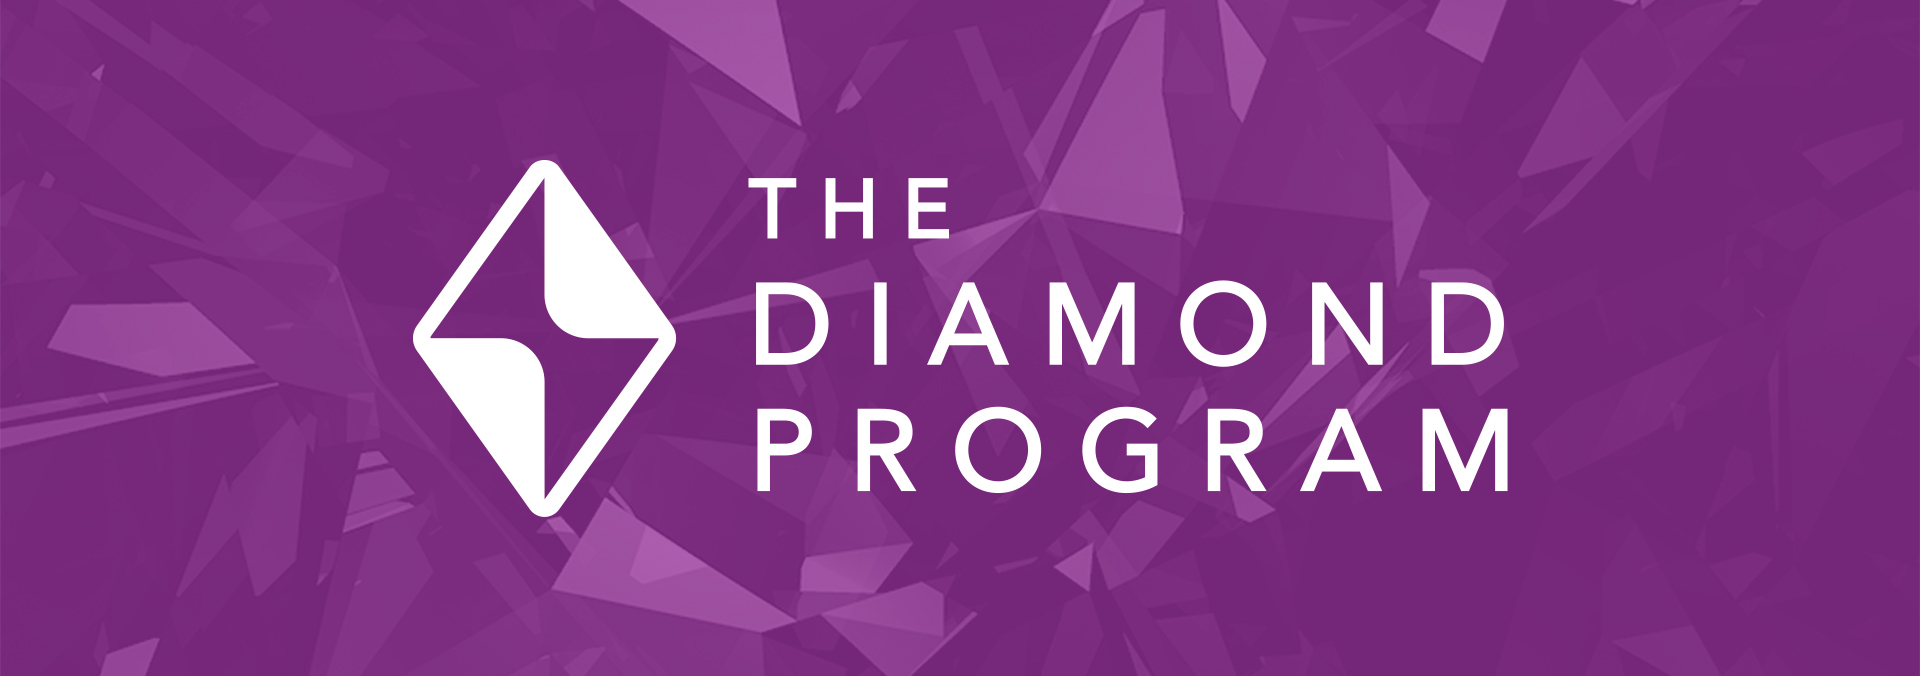 The Diamond Program